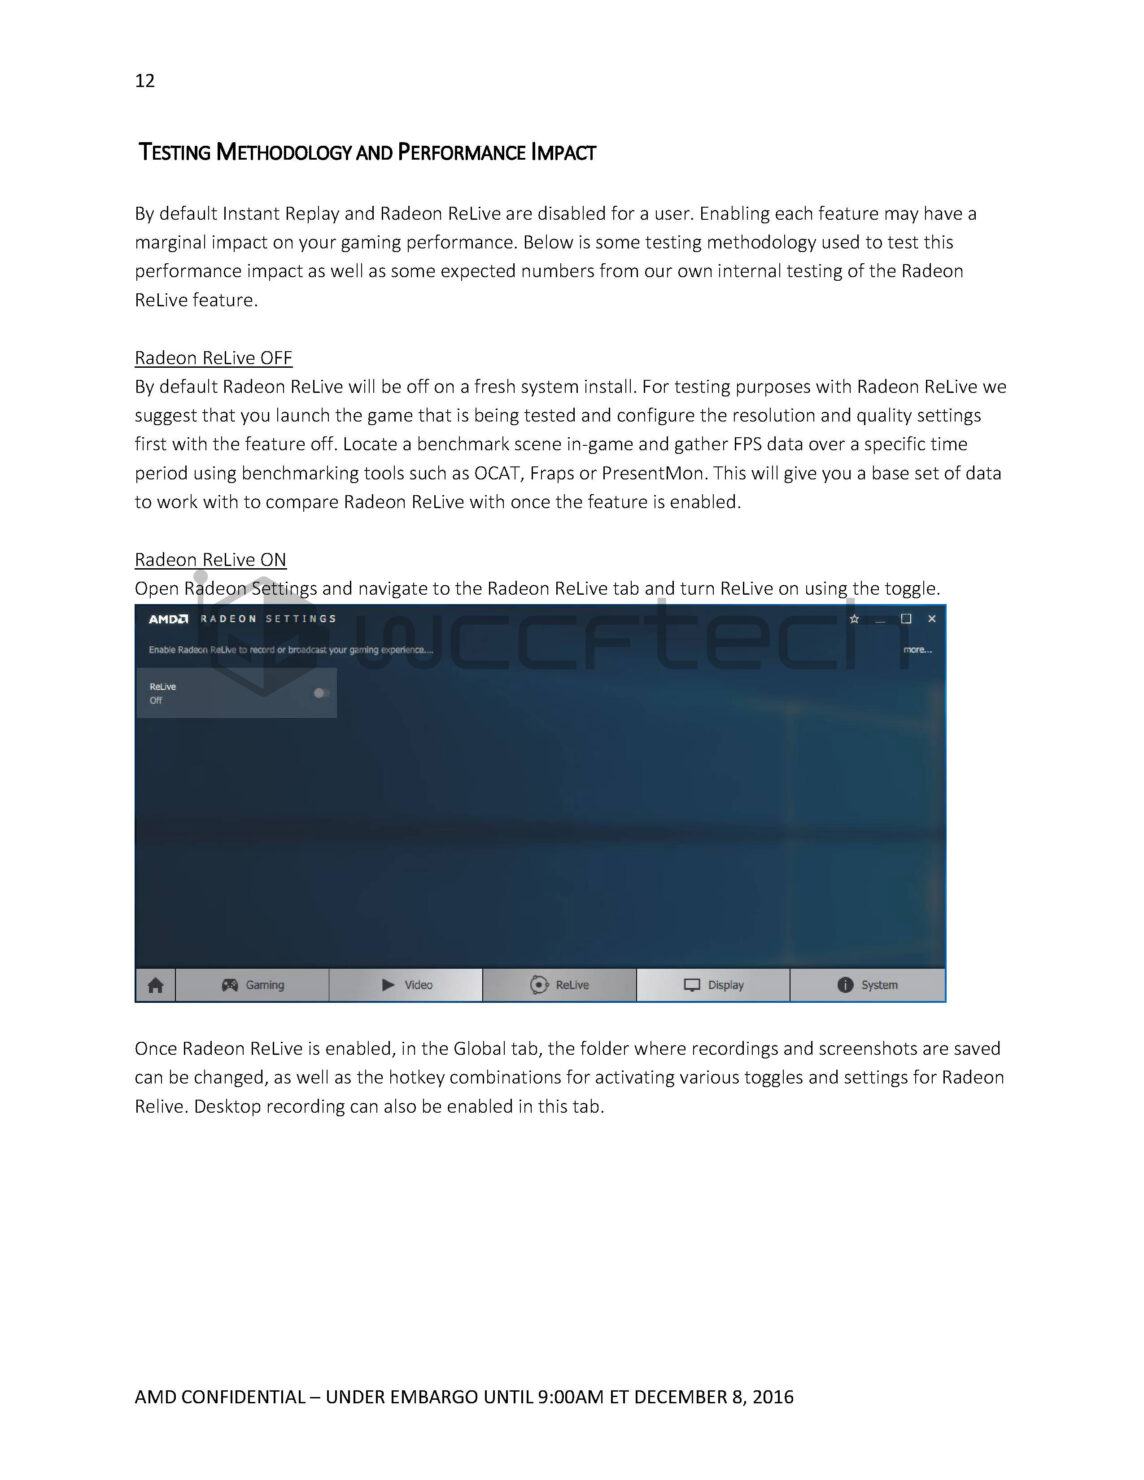 file-page12-copy